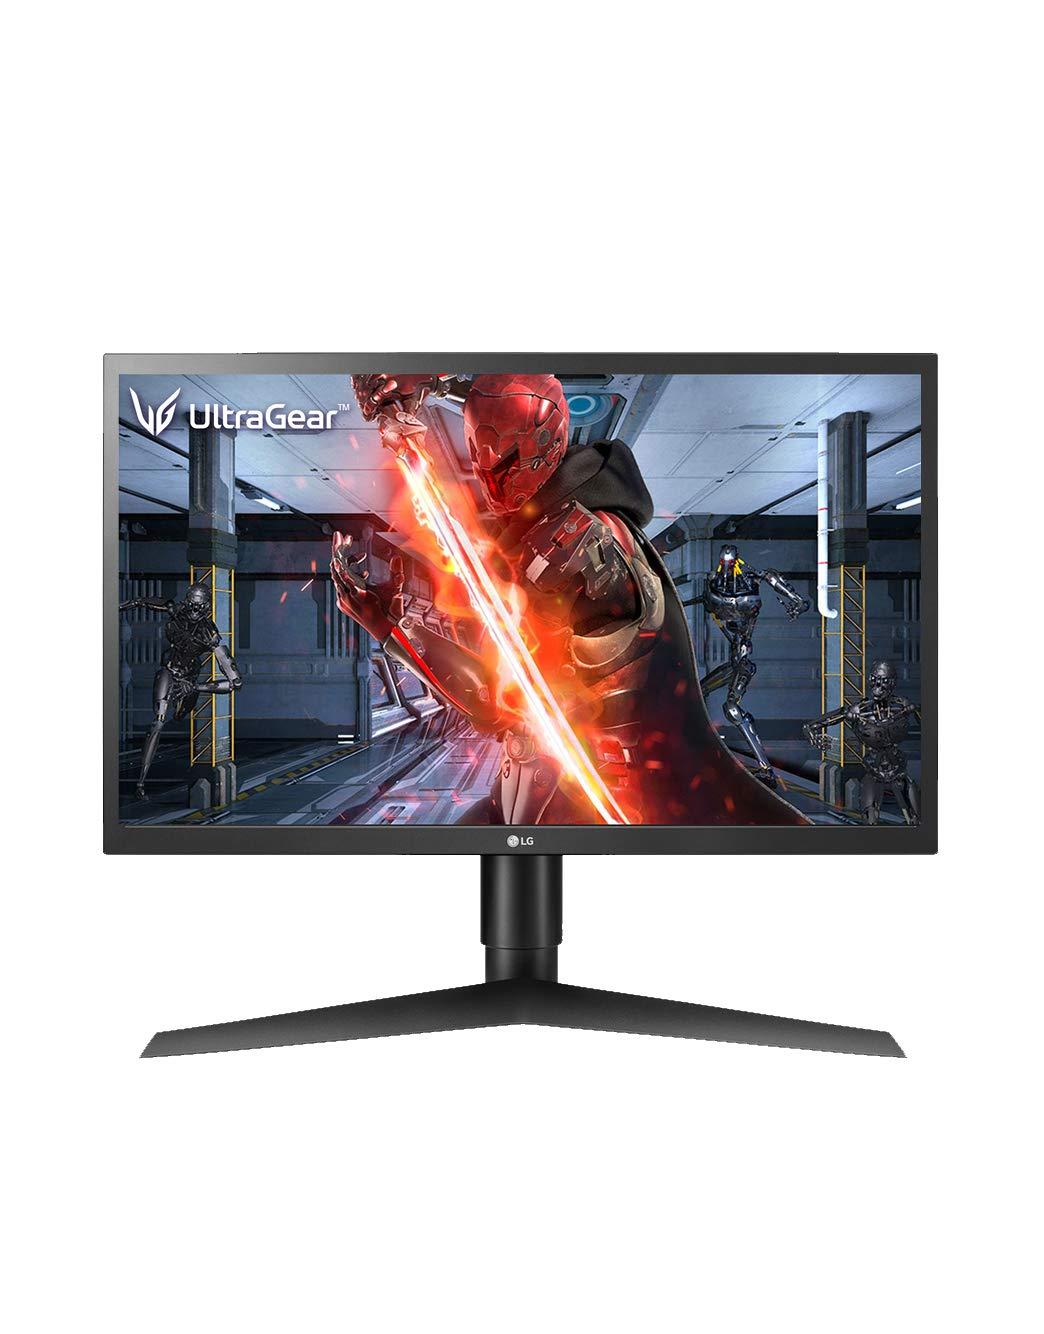 LG Ultragear 24GL650F best Monitor under 15000